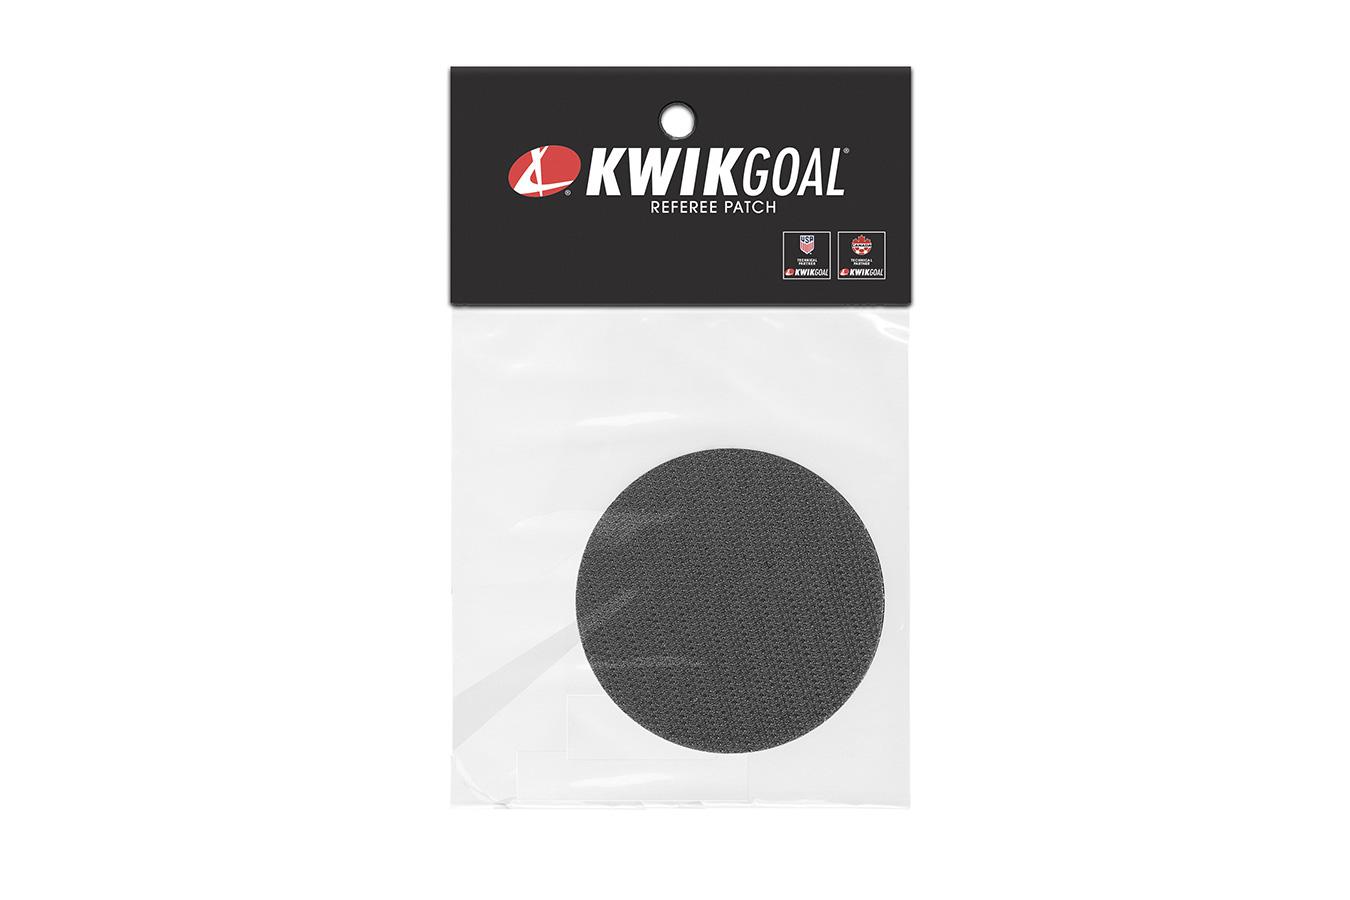 Kwik Goal Referee Patch